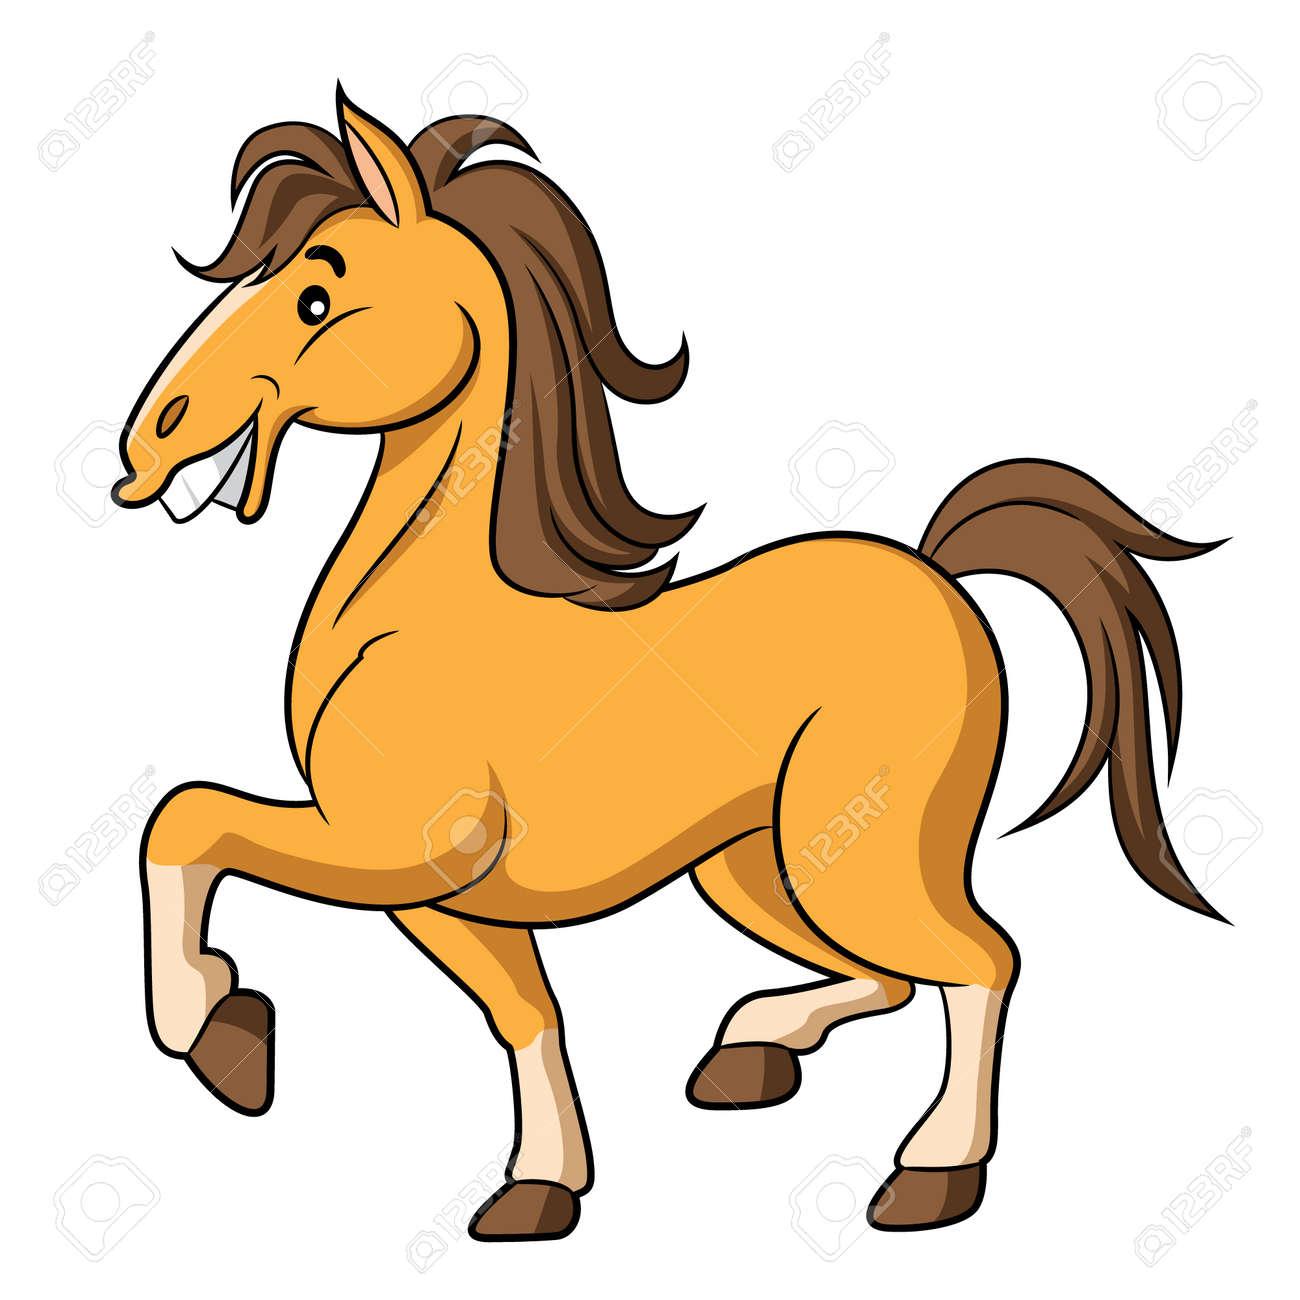 illustration of cute cartoon horse royalty free cliparts vectors rh 123rf com cute horse clipart black and white Cartoon Horse Clip Art